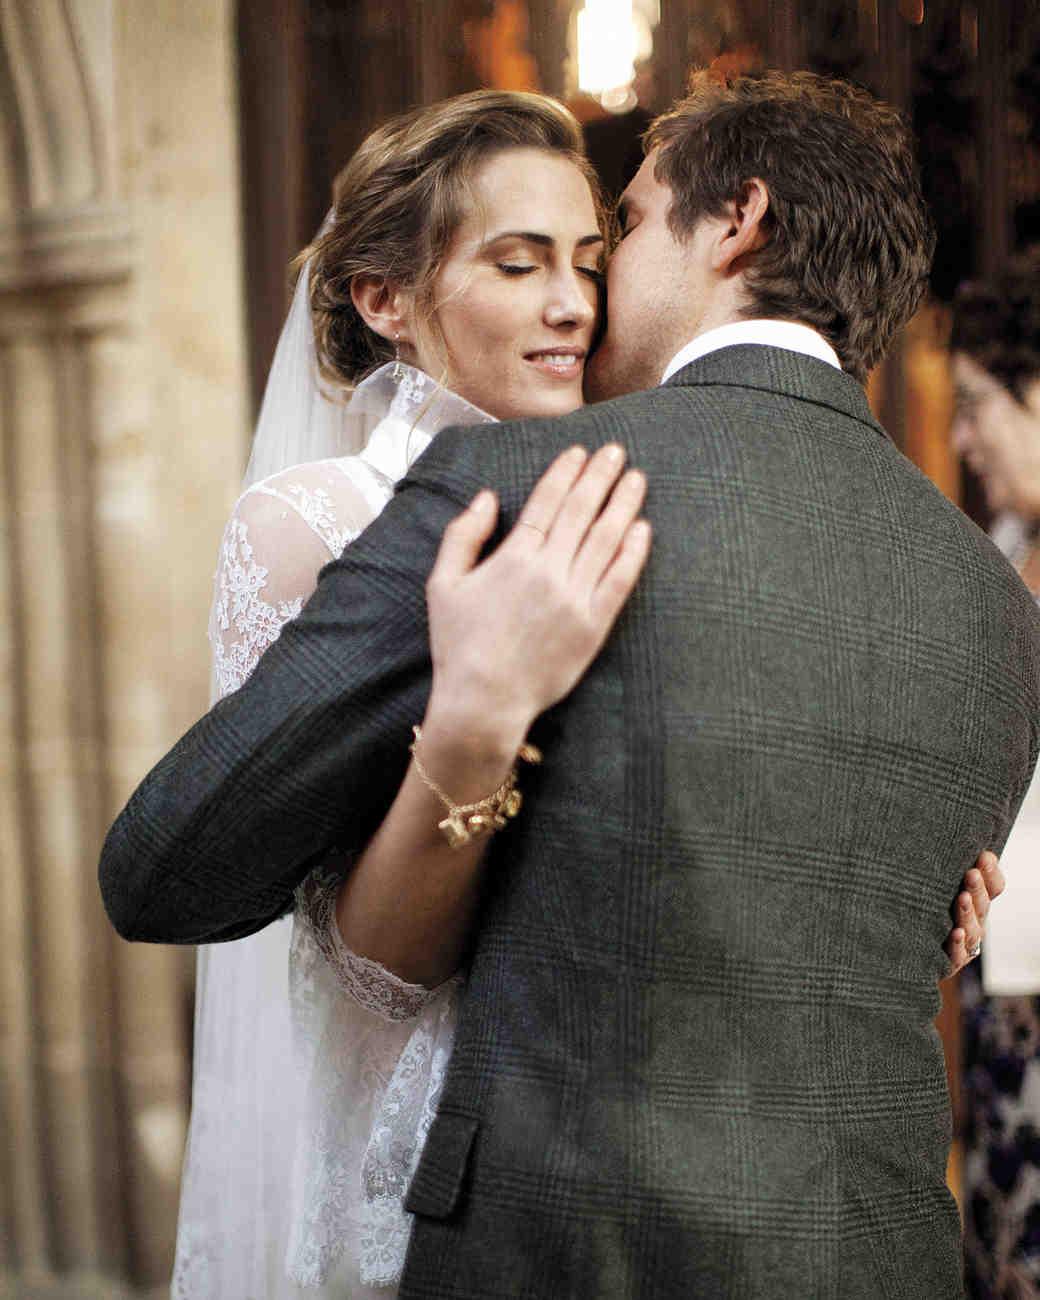 rw-heather-neal-bride-groom-dance-ms107641.jpg